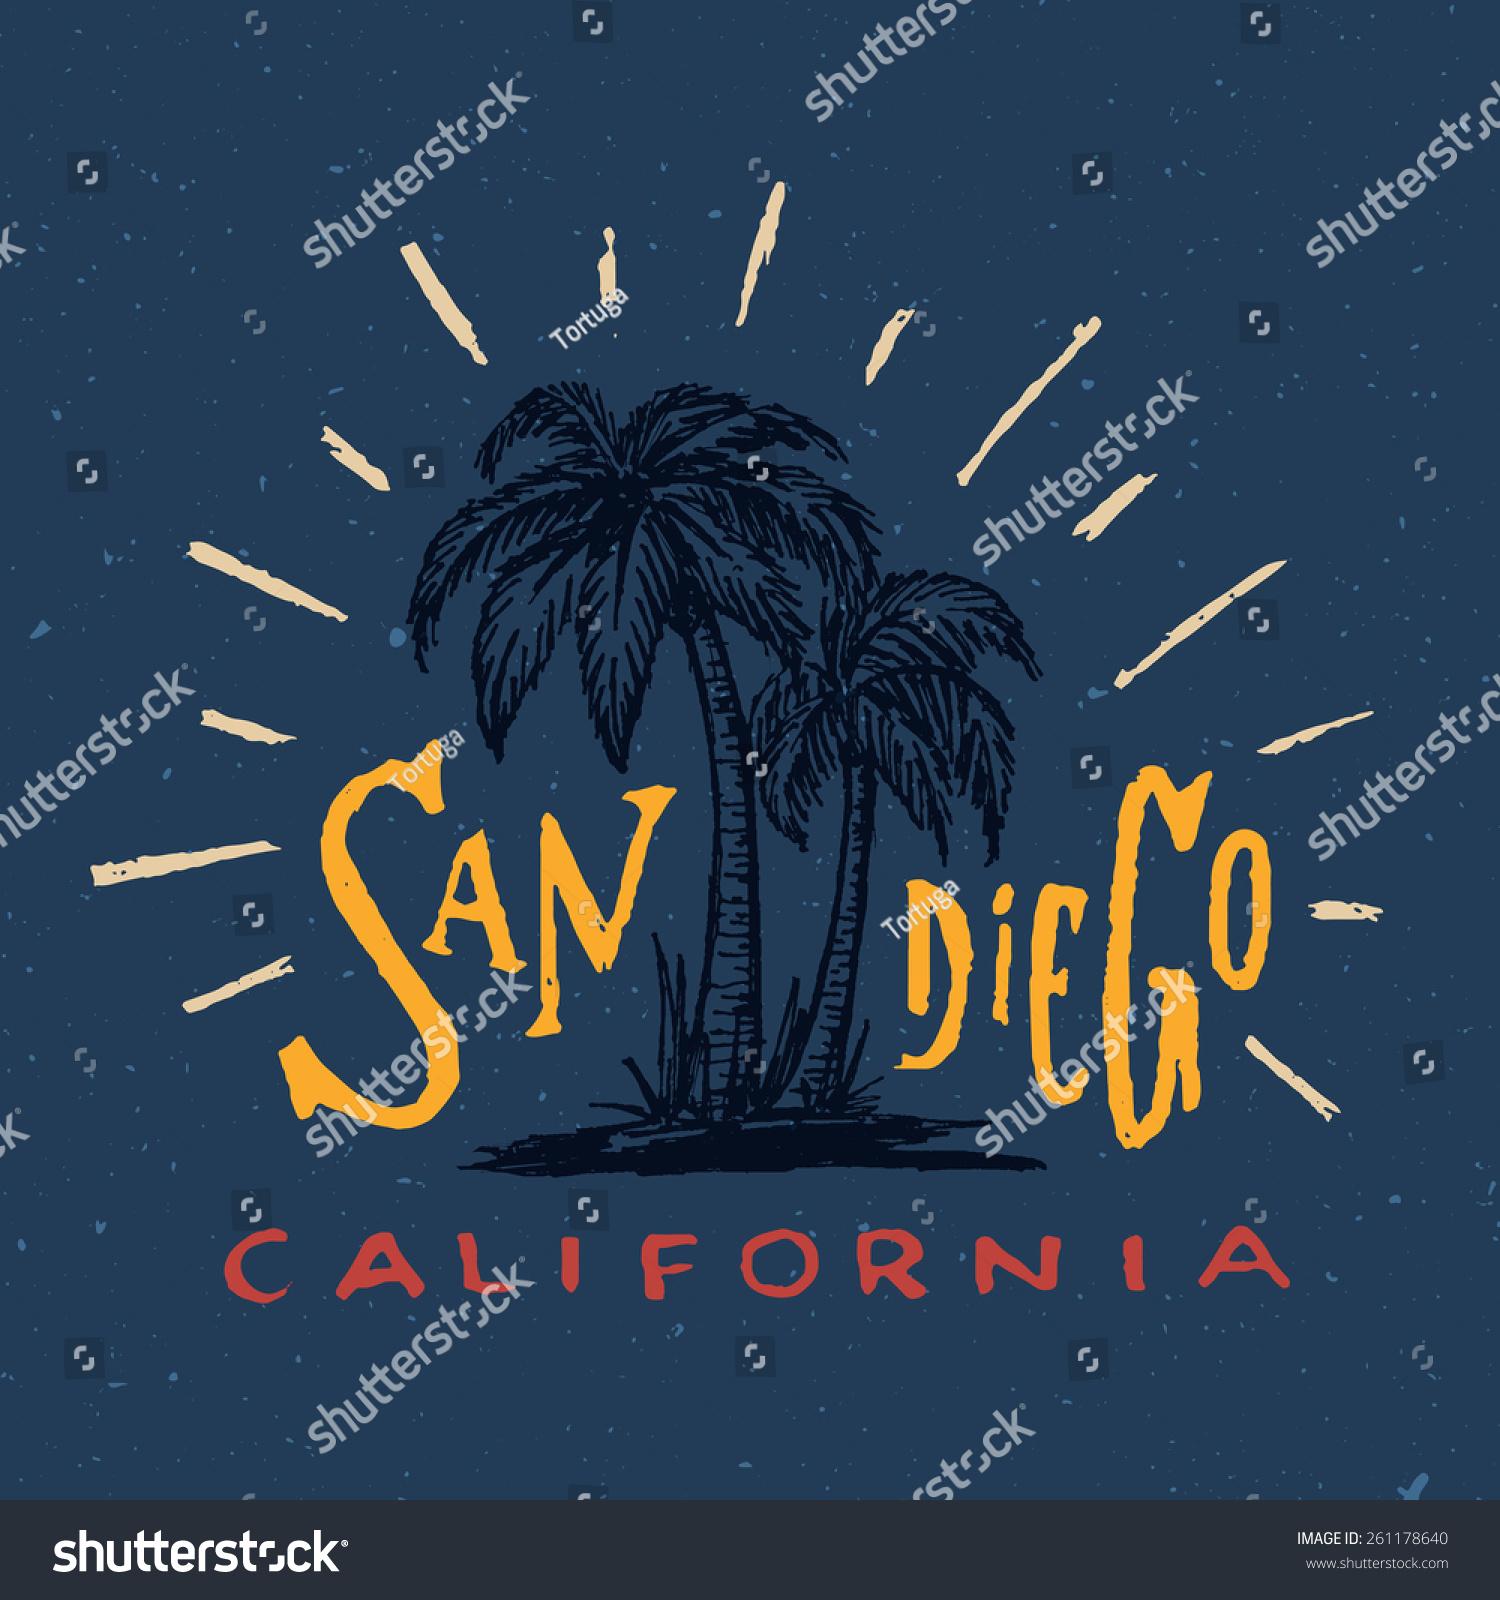 Shirt design san diego - San Diego T Shirt Graphic Vintage Apparel Fashion Tee Design Retro Urban Youth Textured